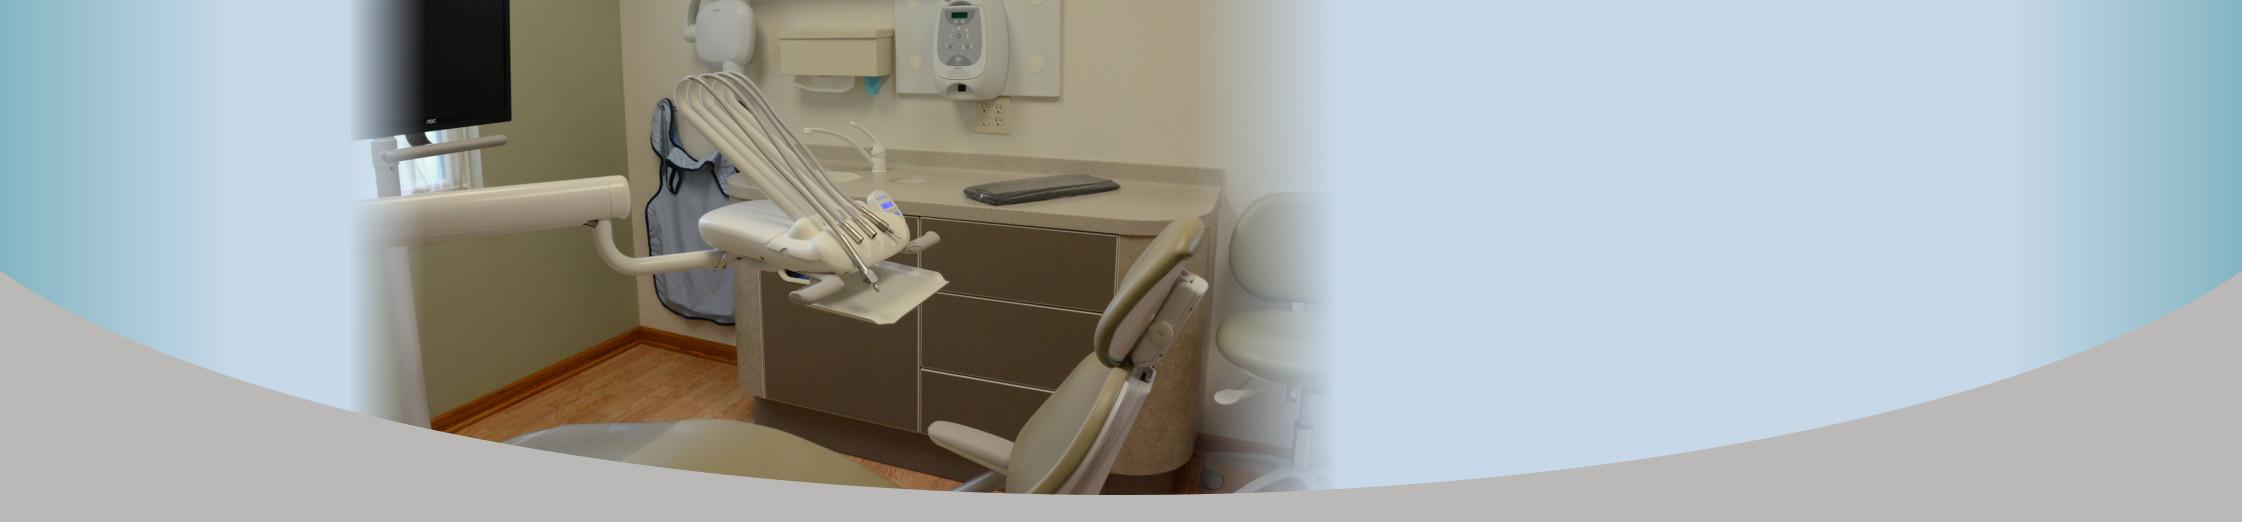 downtown dental inc, general dentistry